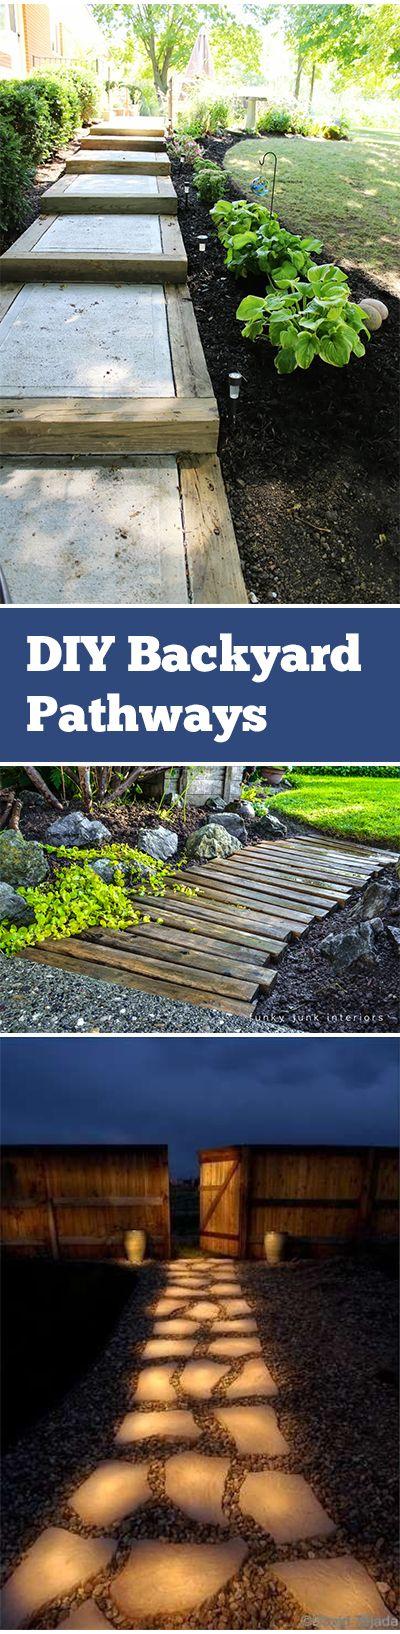 DIY-Backyard-Pathways-1.jpg 400×1,634 pixeles